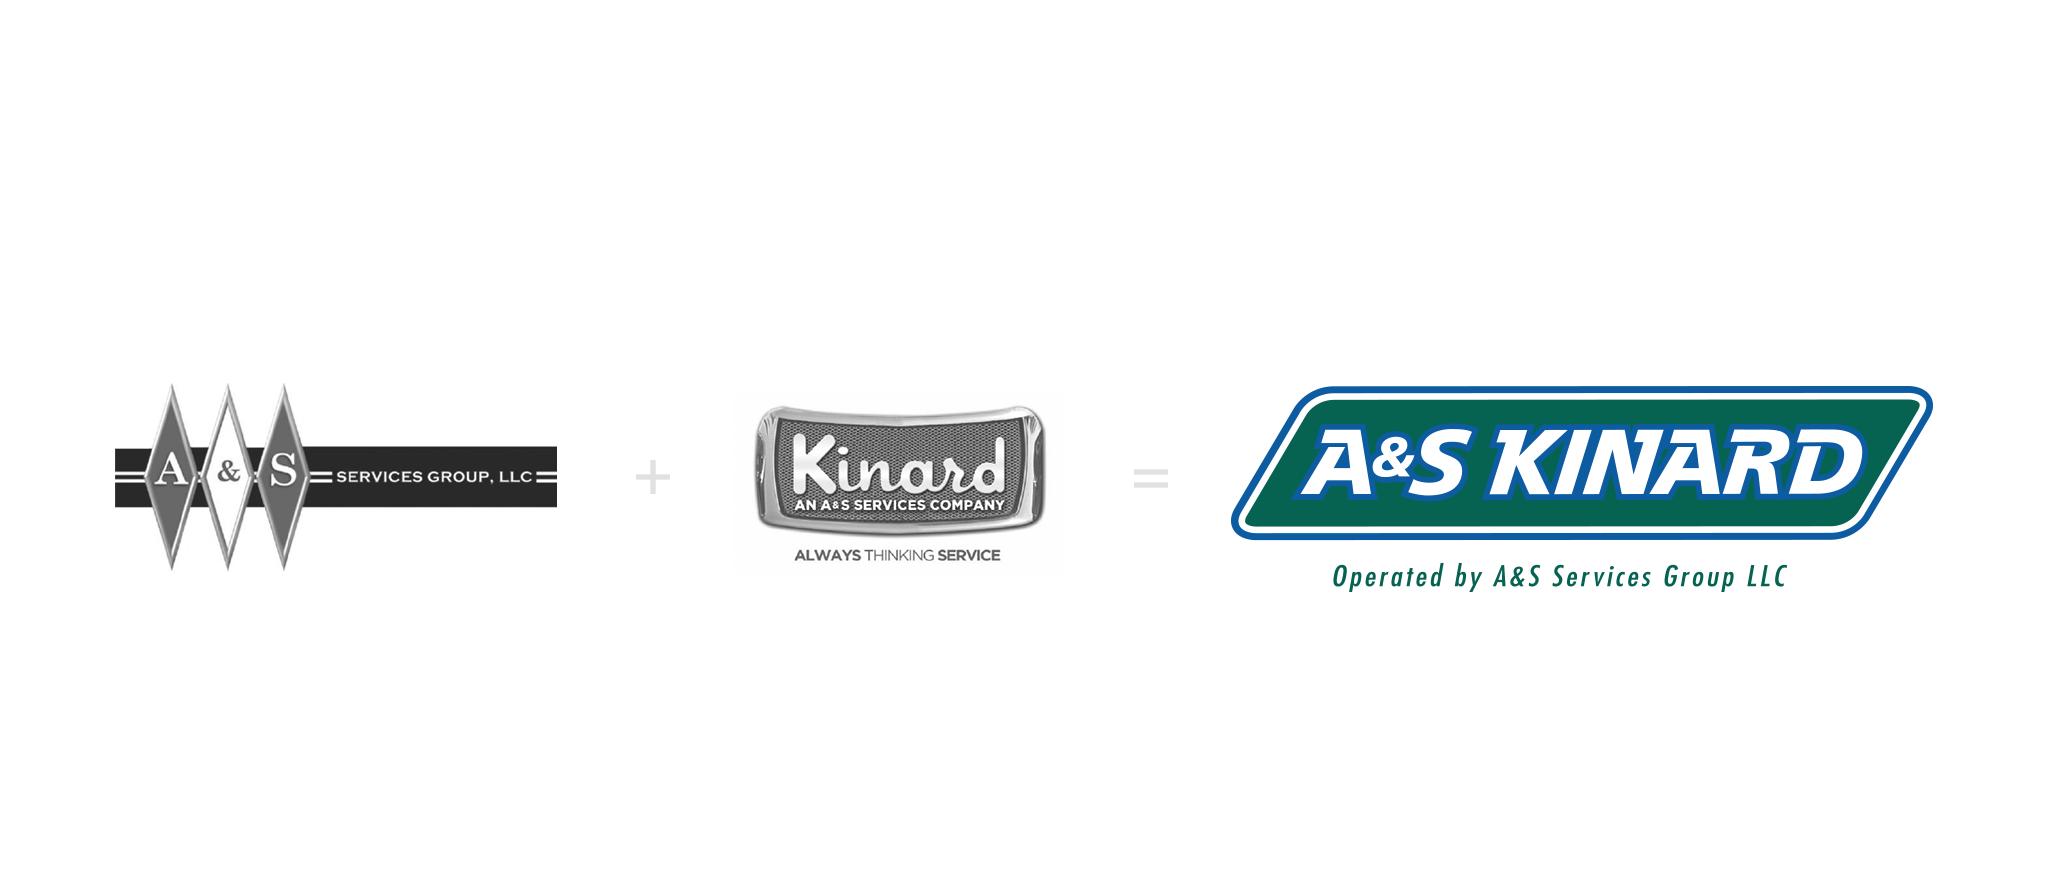 A&S-Kinard_10.png